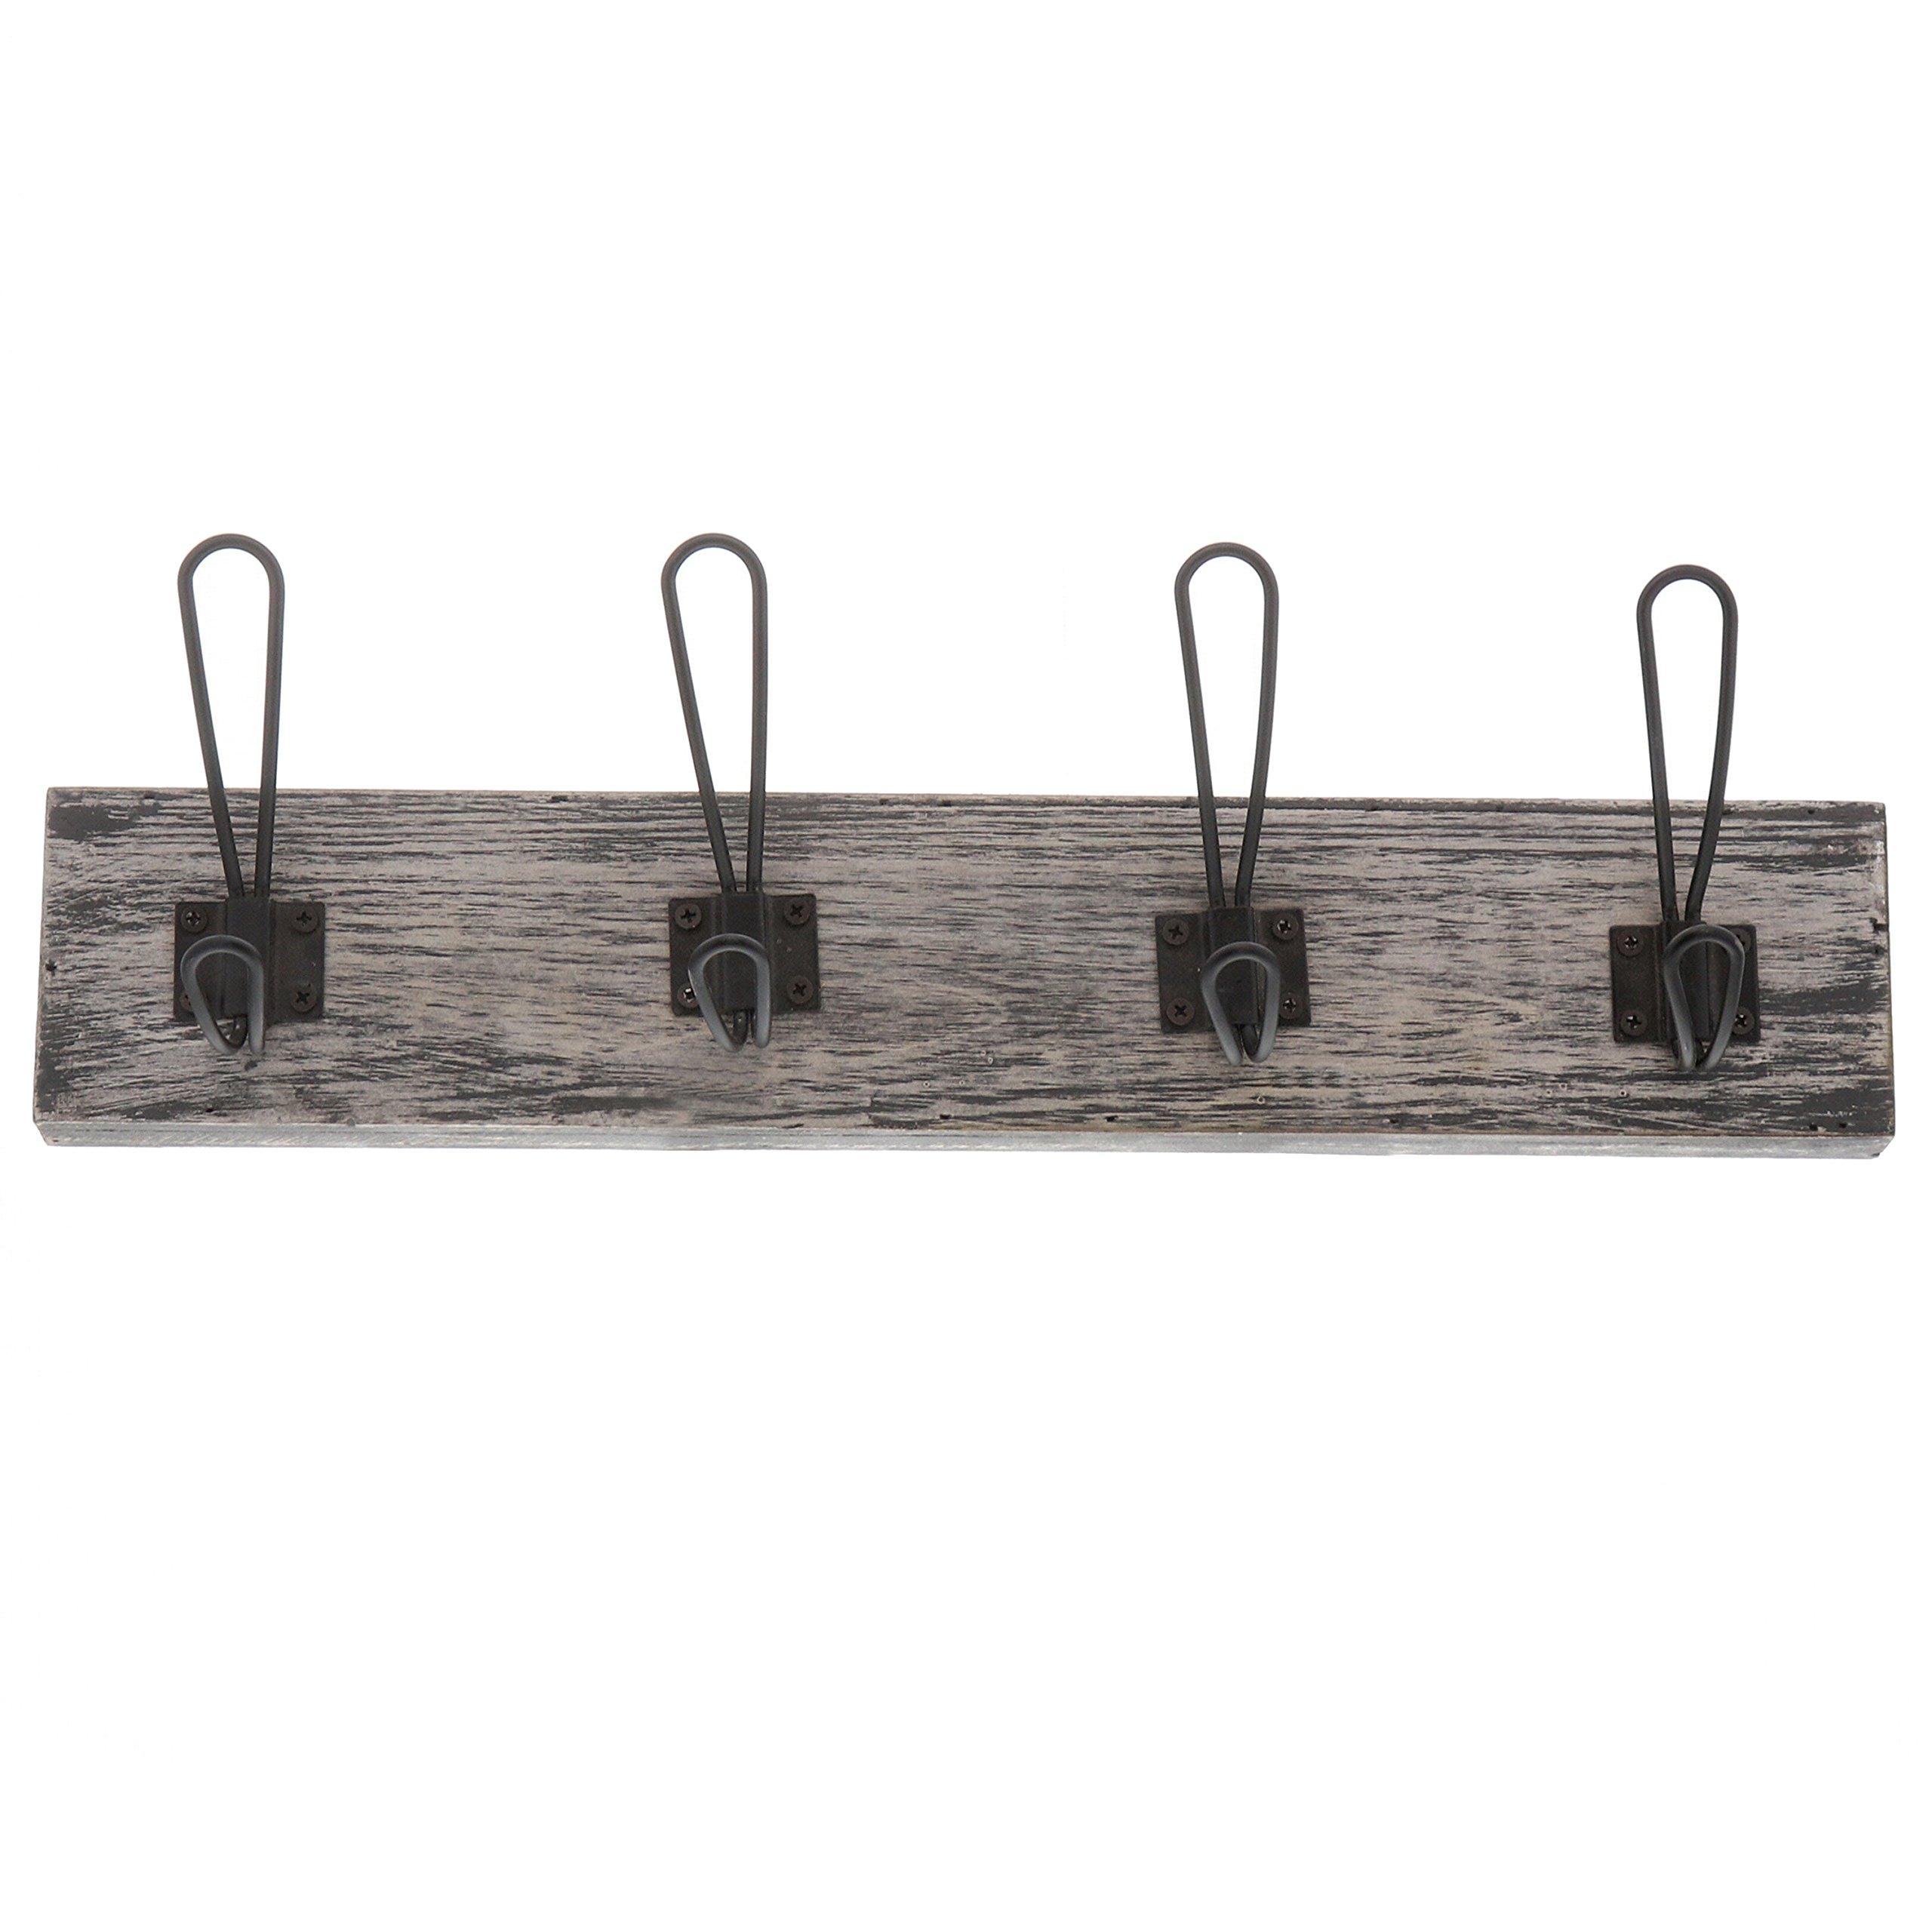 "Barnyard Designs Wall Hook Rack Rustic Decorative Hanging Coat Rack, Hats, Keys, Handbags, Backpacks, and More 19"" x 6"" (4-Hooks)"